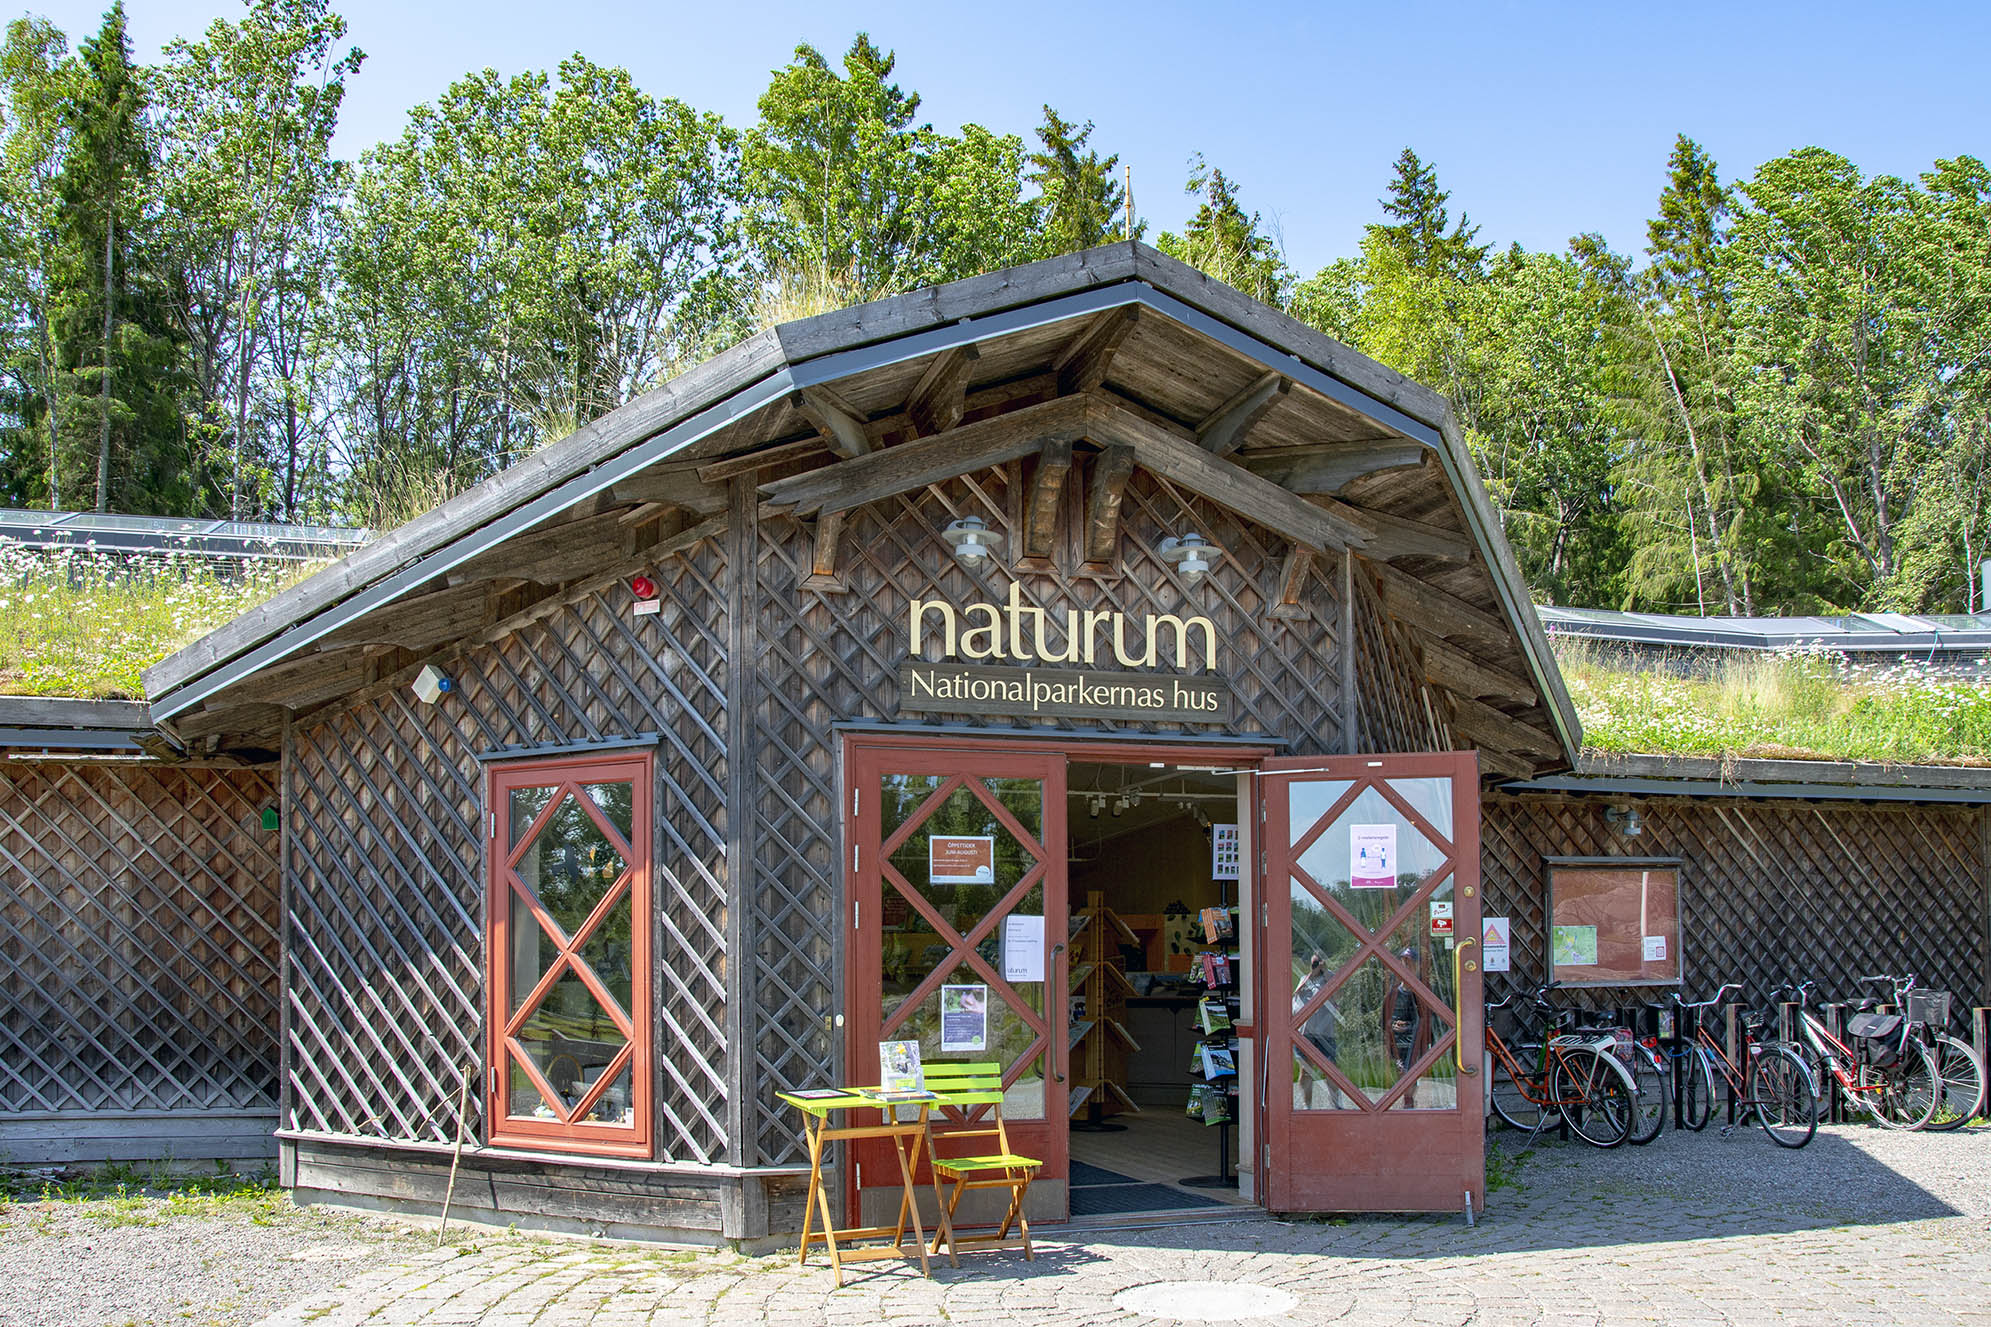 Naturum Tyresta Nationalpark